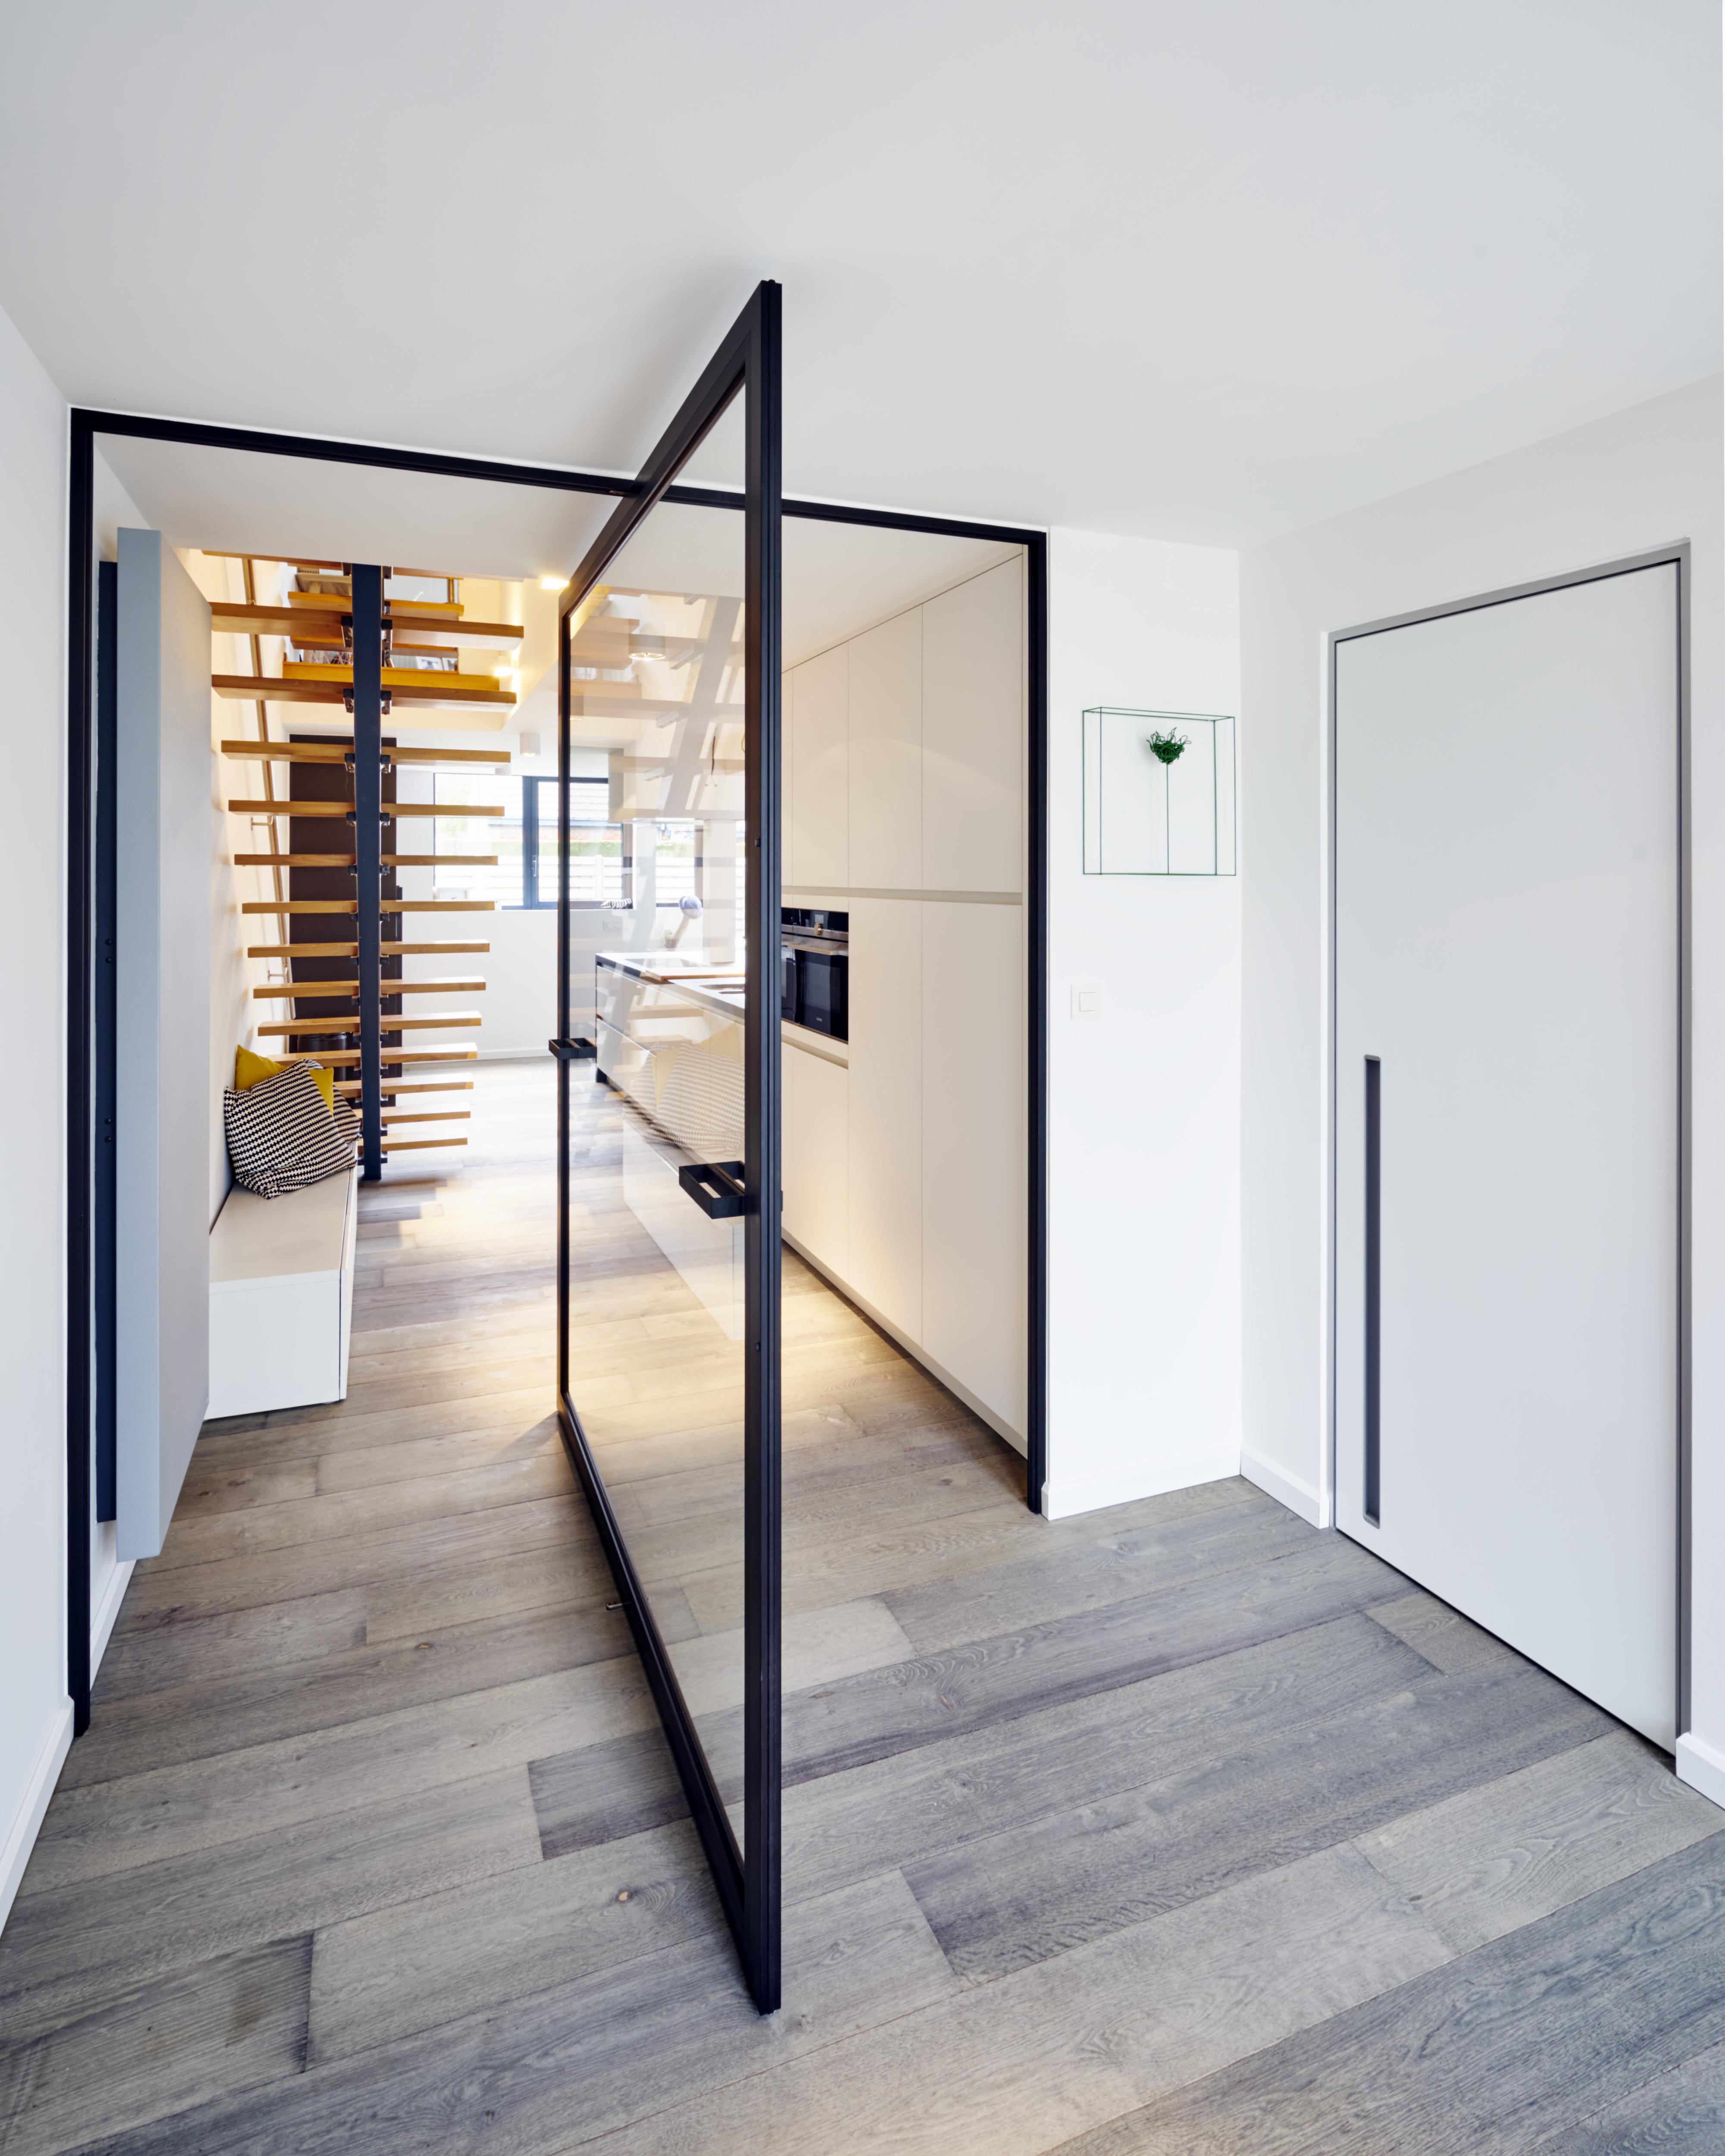 Door Concept AKA Room Divider - Porte pivot